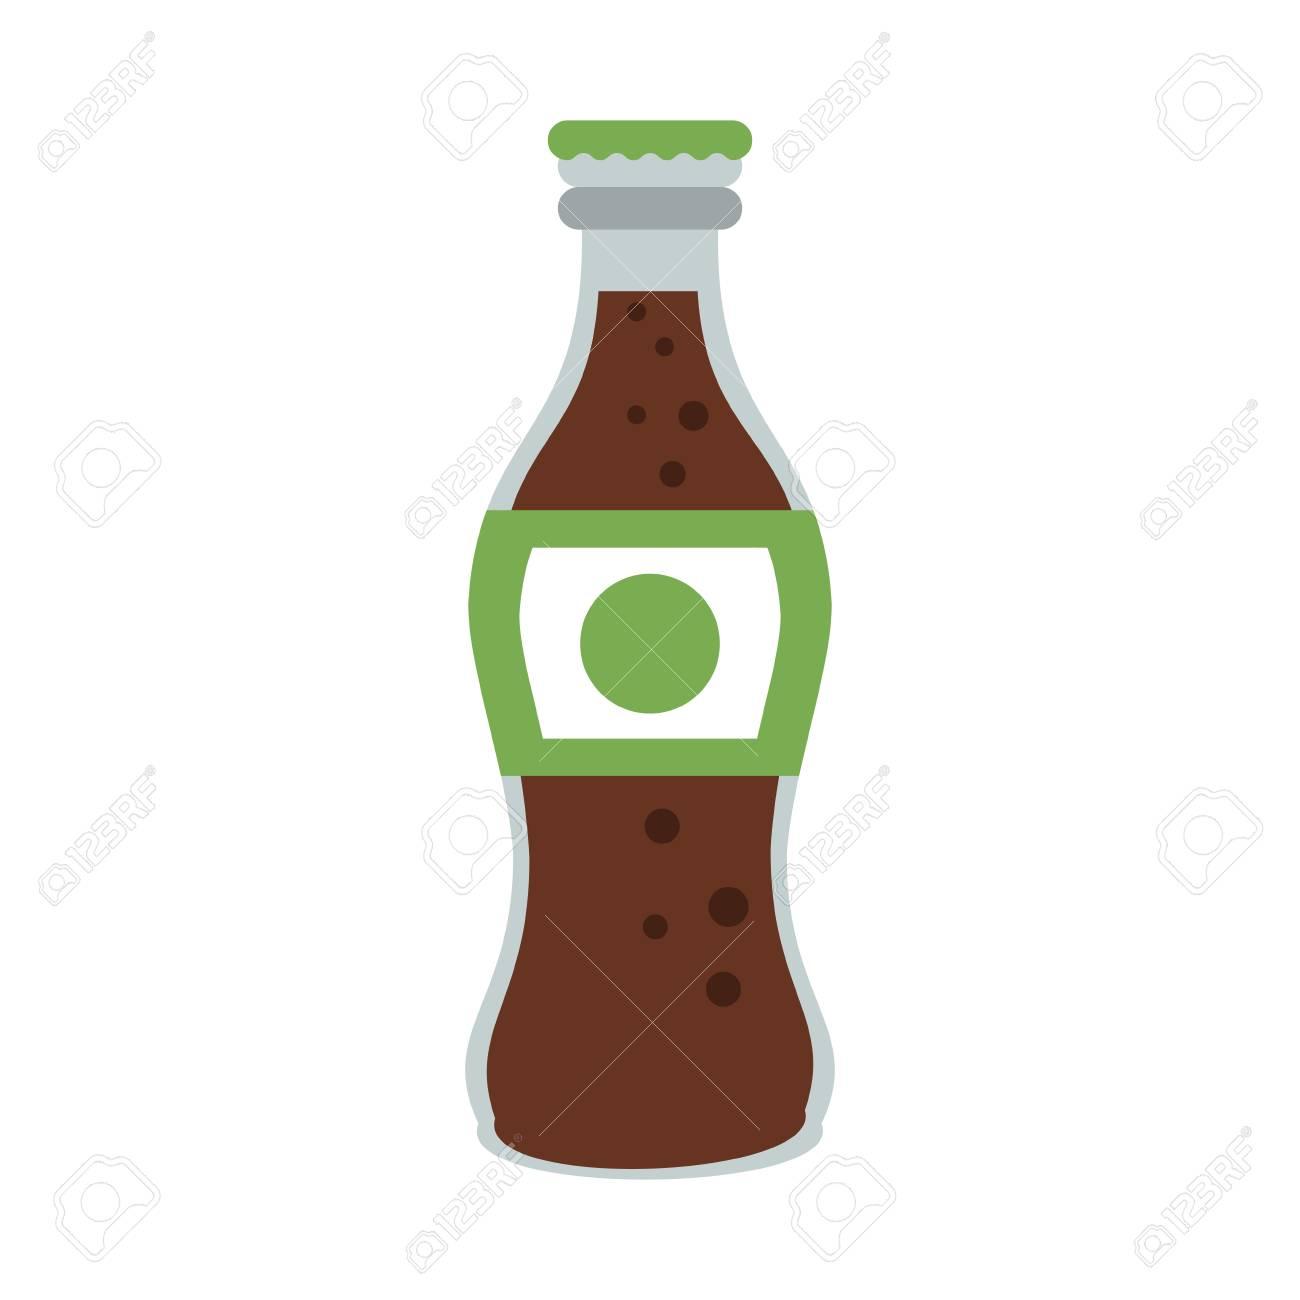 bouteille de verre soda icône vector illustration design graphique